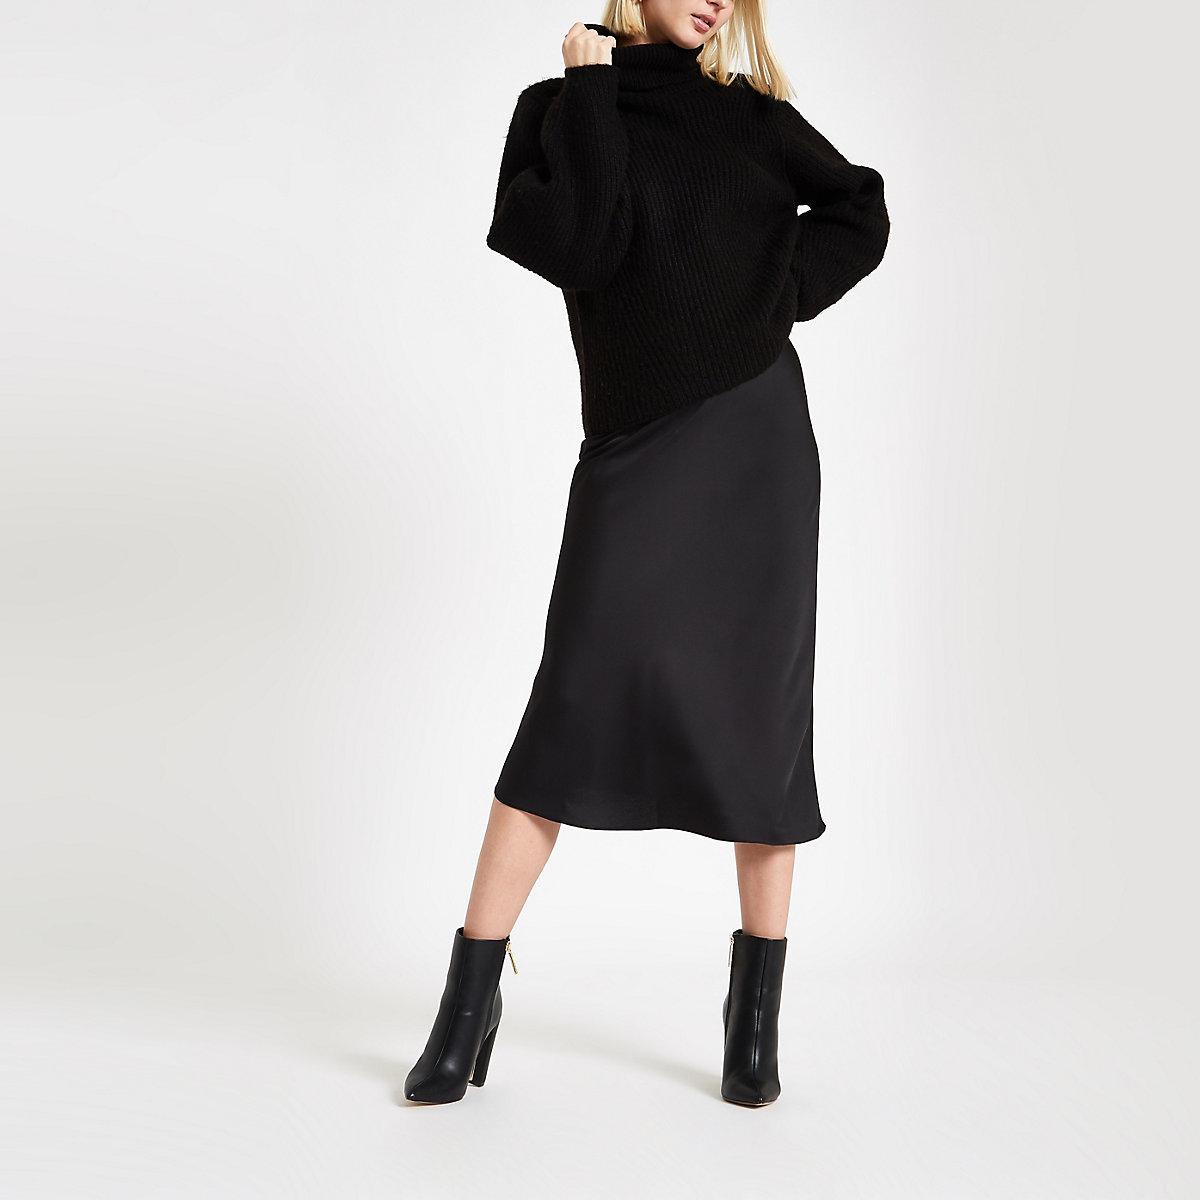 Black bias satin midi skirt